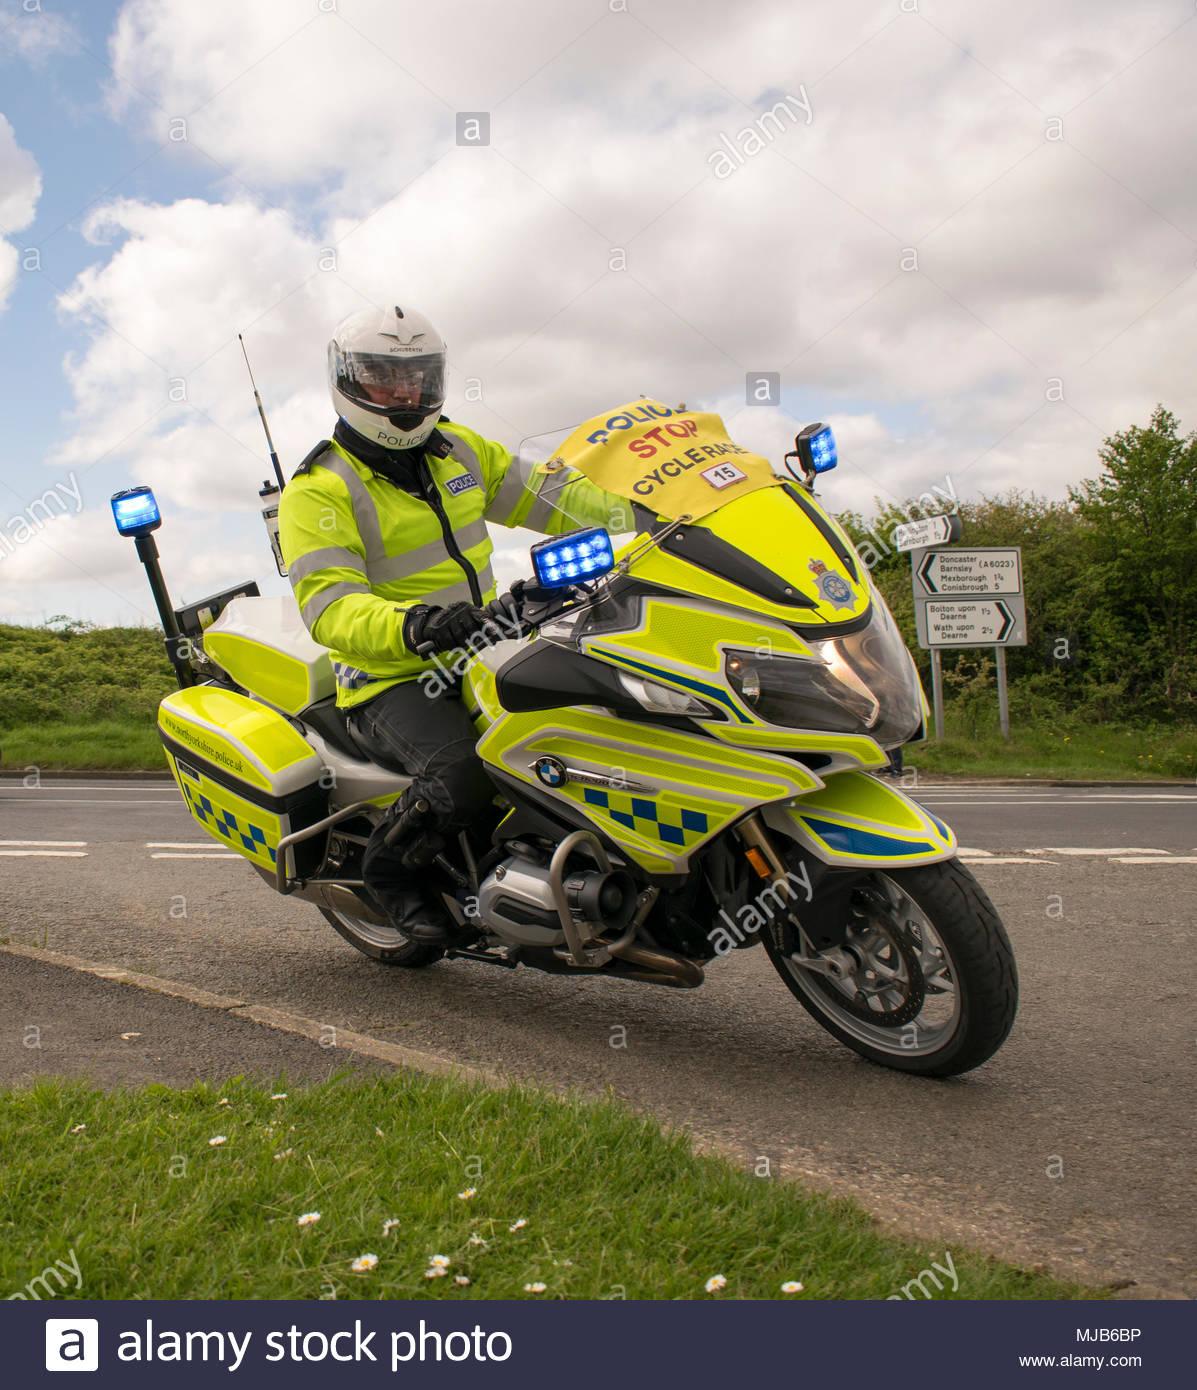 Motocicleta de la policía británica oficial de tránsito con el Tour de Yorkshire 2018 Fase 2 mujeres de raza, en Adwick a Dearne, Mexborough, Doncaster, South Yo Imagen De Stock